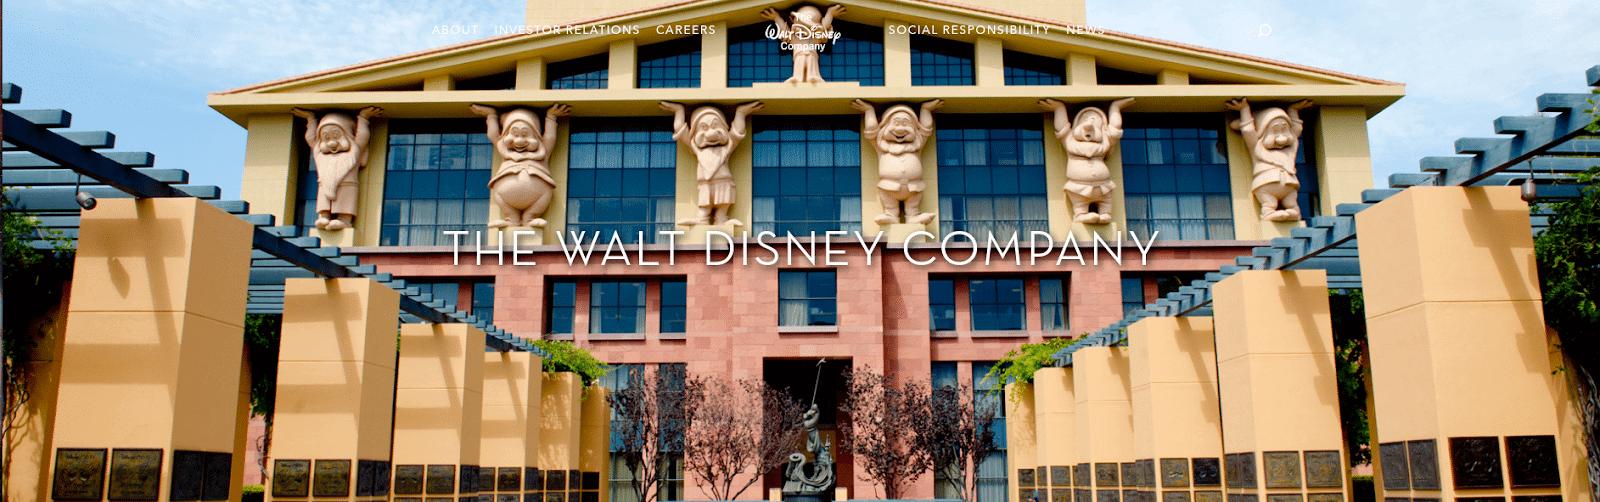 Walt Disney homepage screenshot.